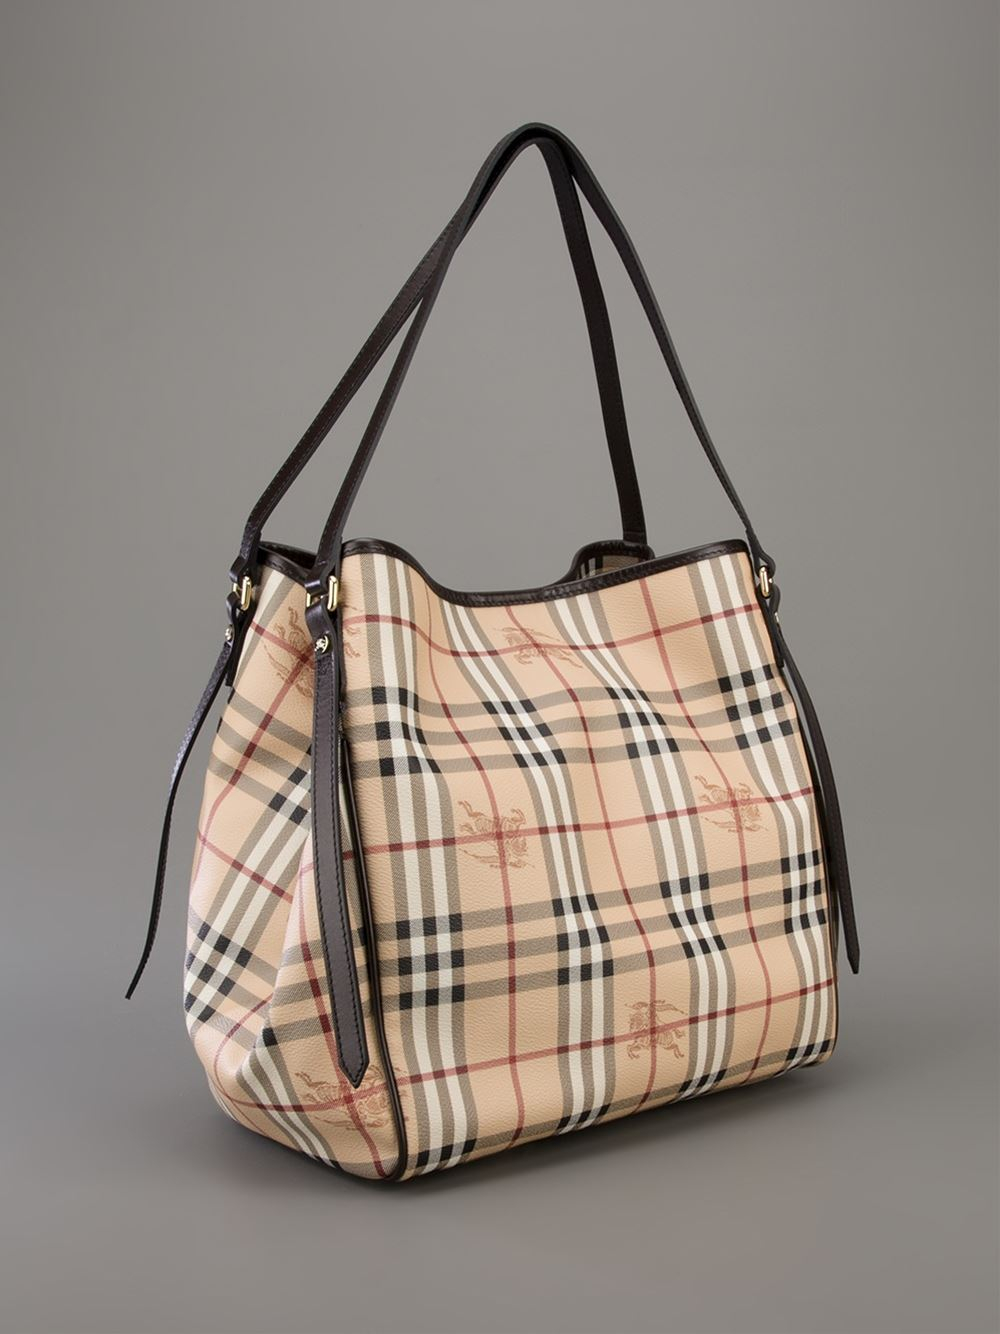 ea9226385319 Lyst - Burberry Canterbury Tote Bag in Brown